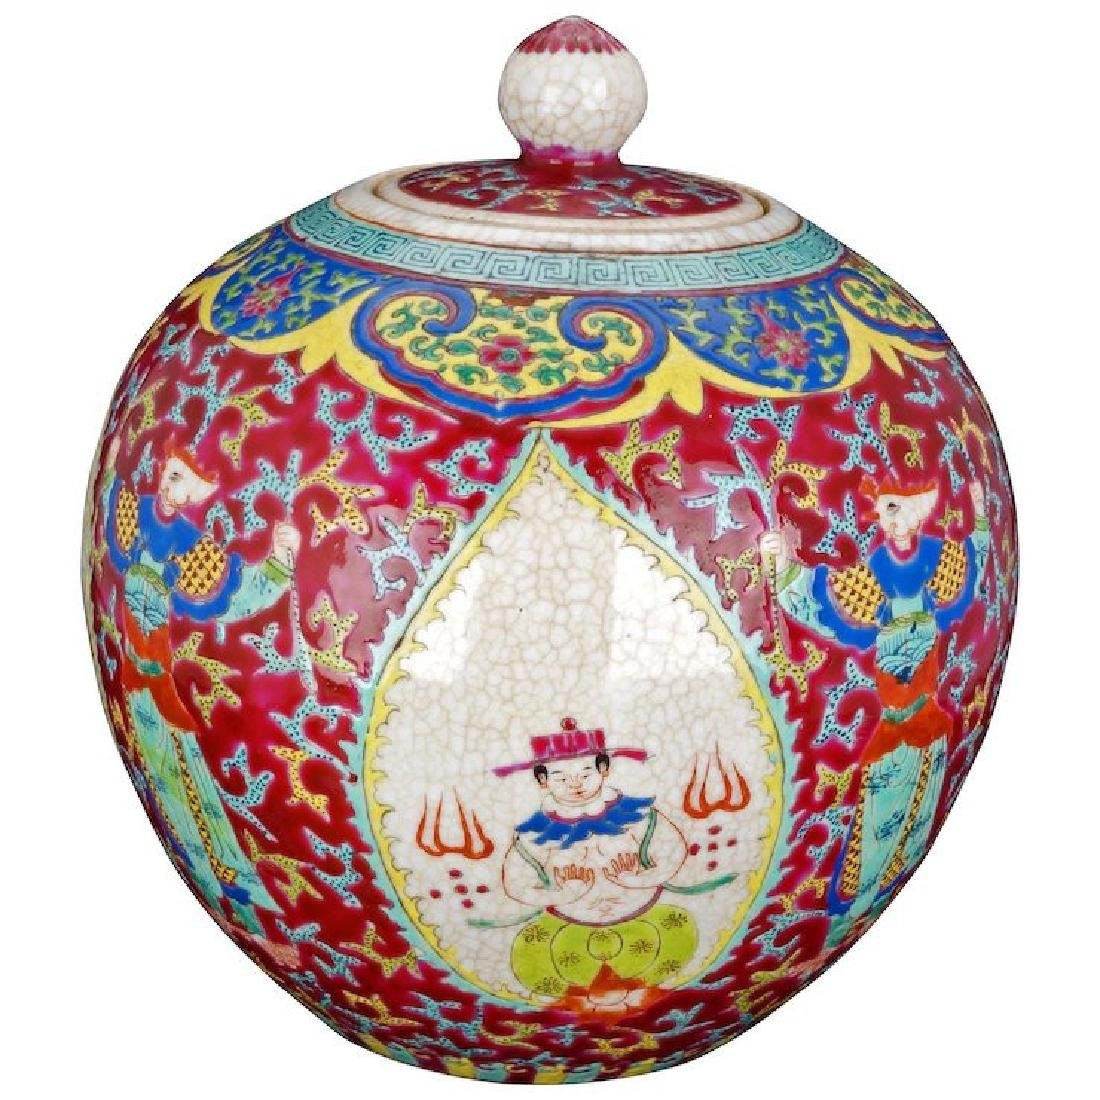 Antique Chinese Ginger Jar with over glaze enamel